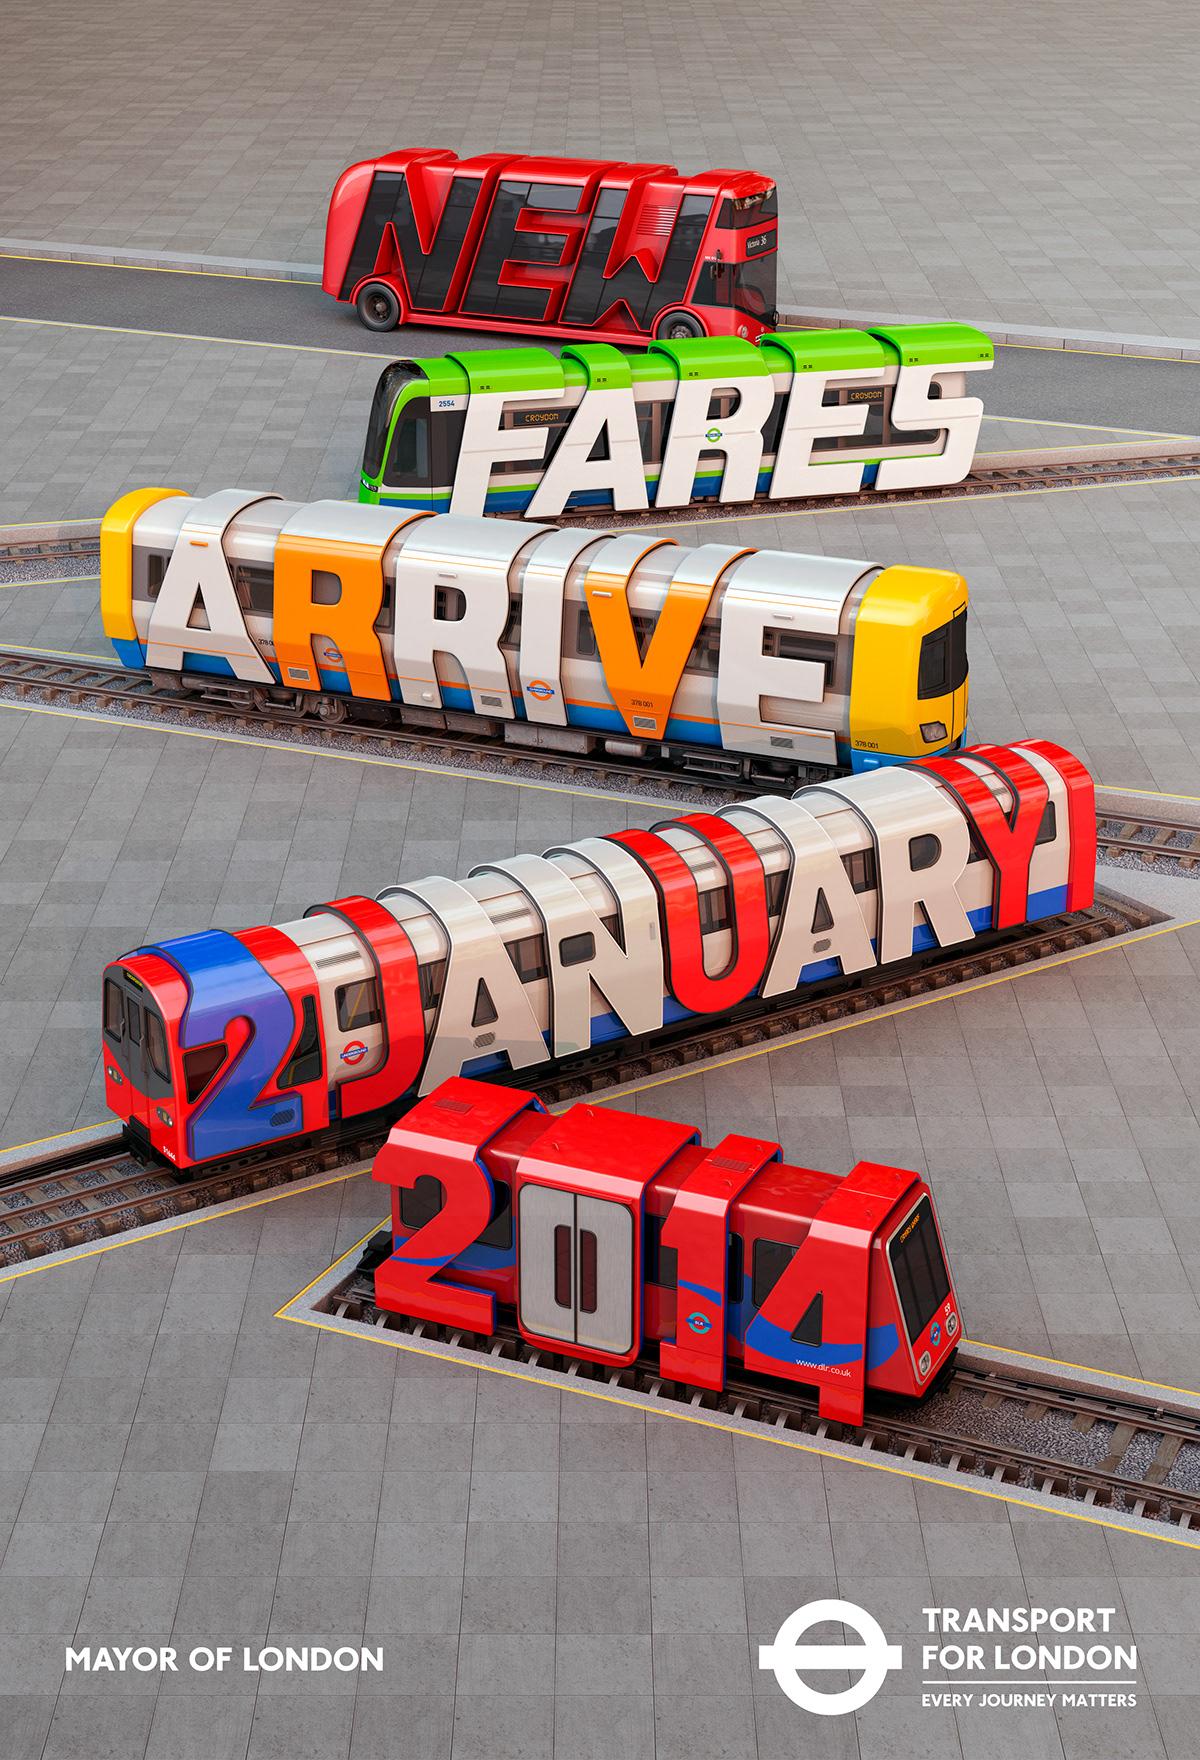 london transport london underground Railways 3D CGI poster new fares 3D typography 3D lettering